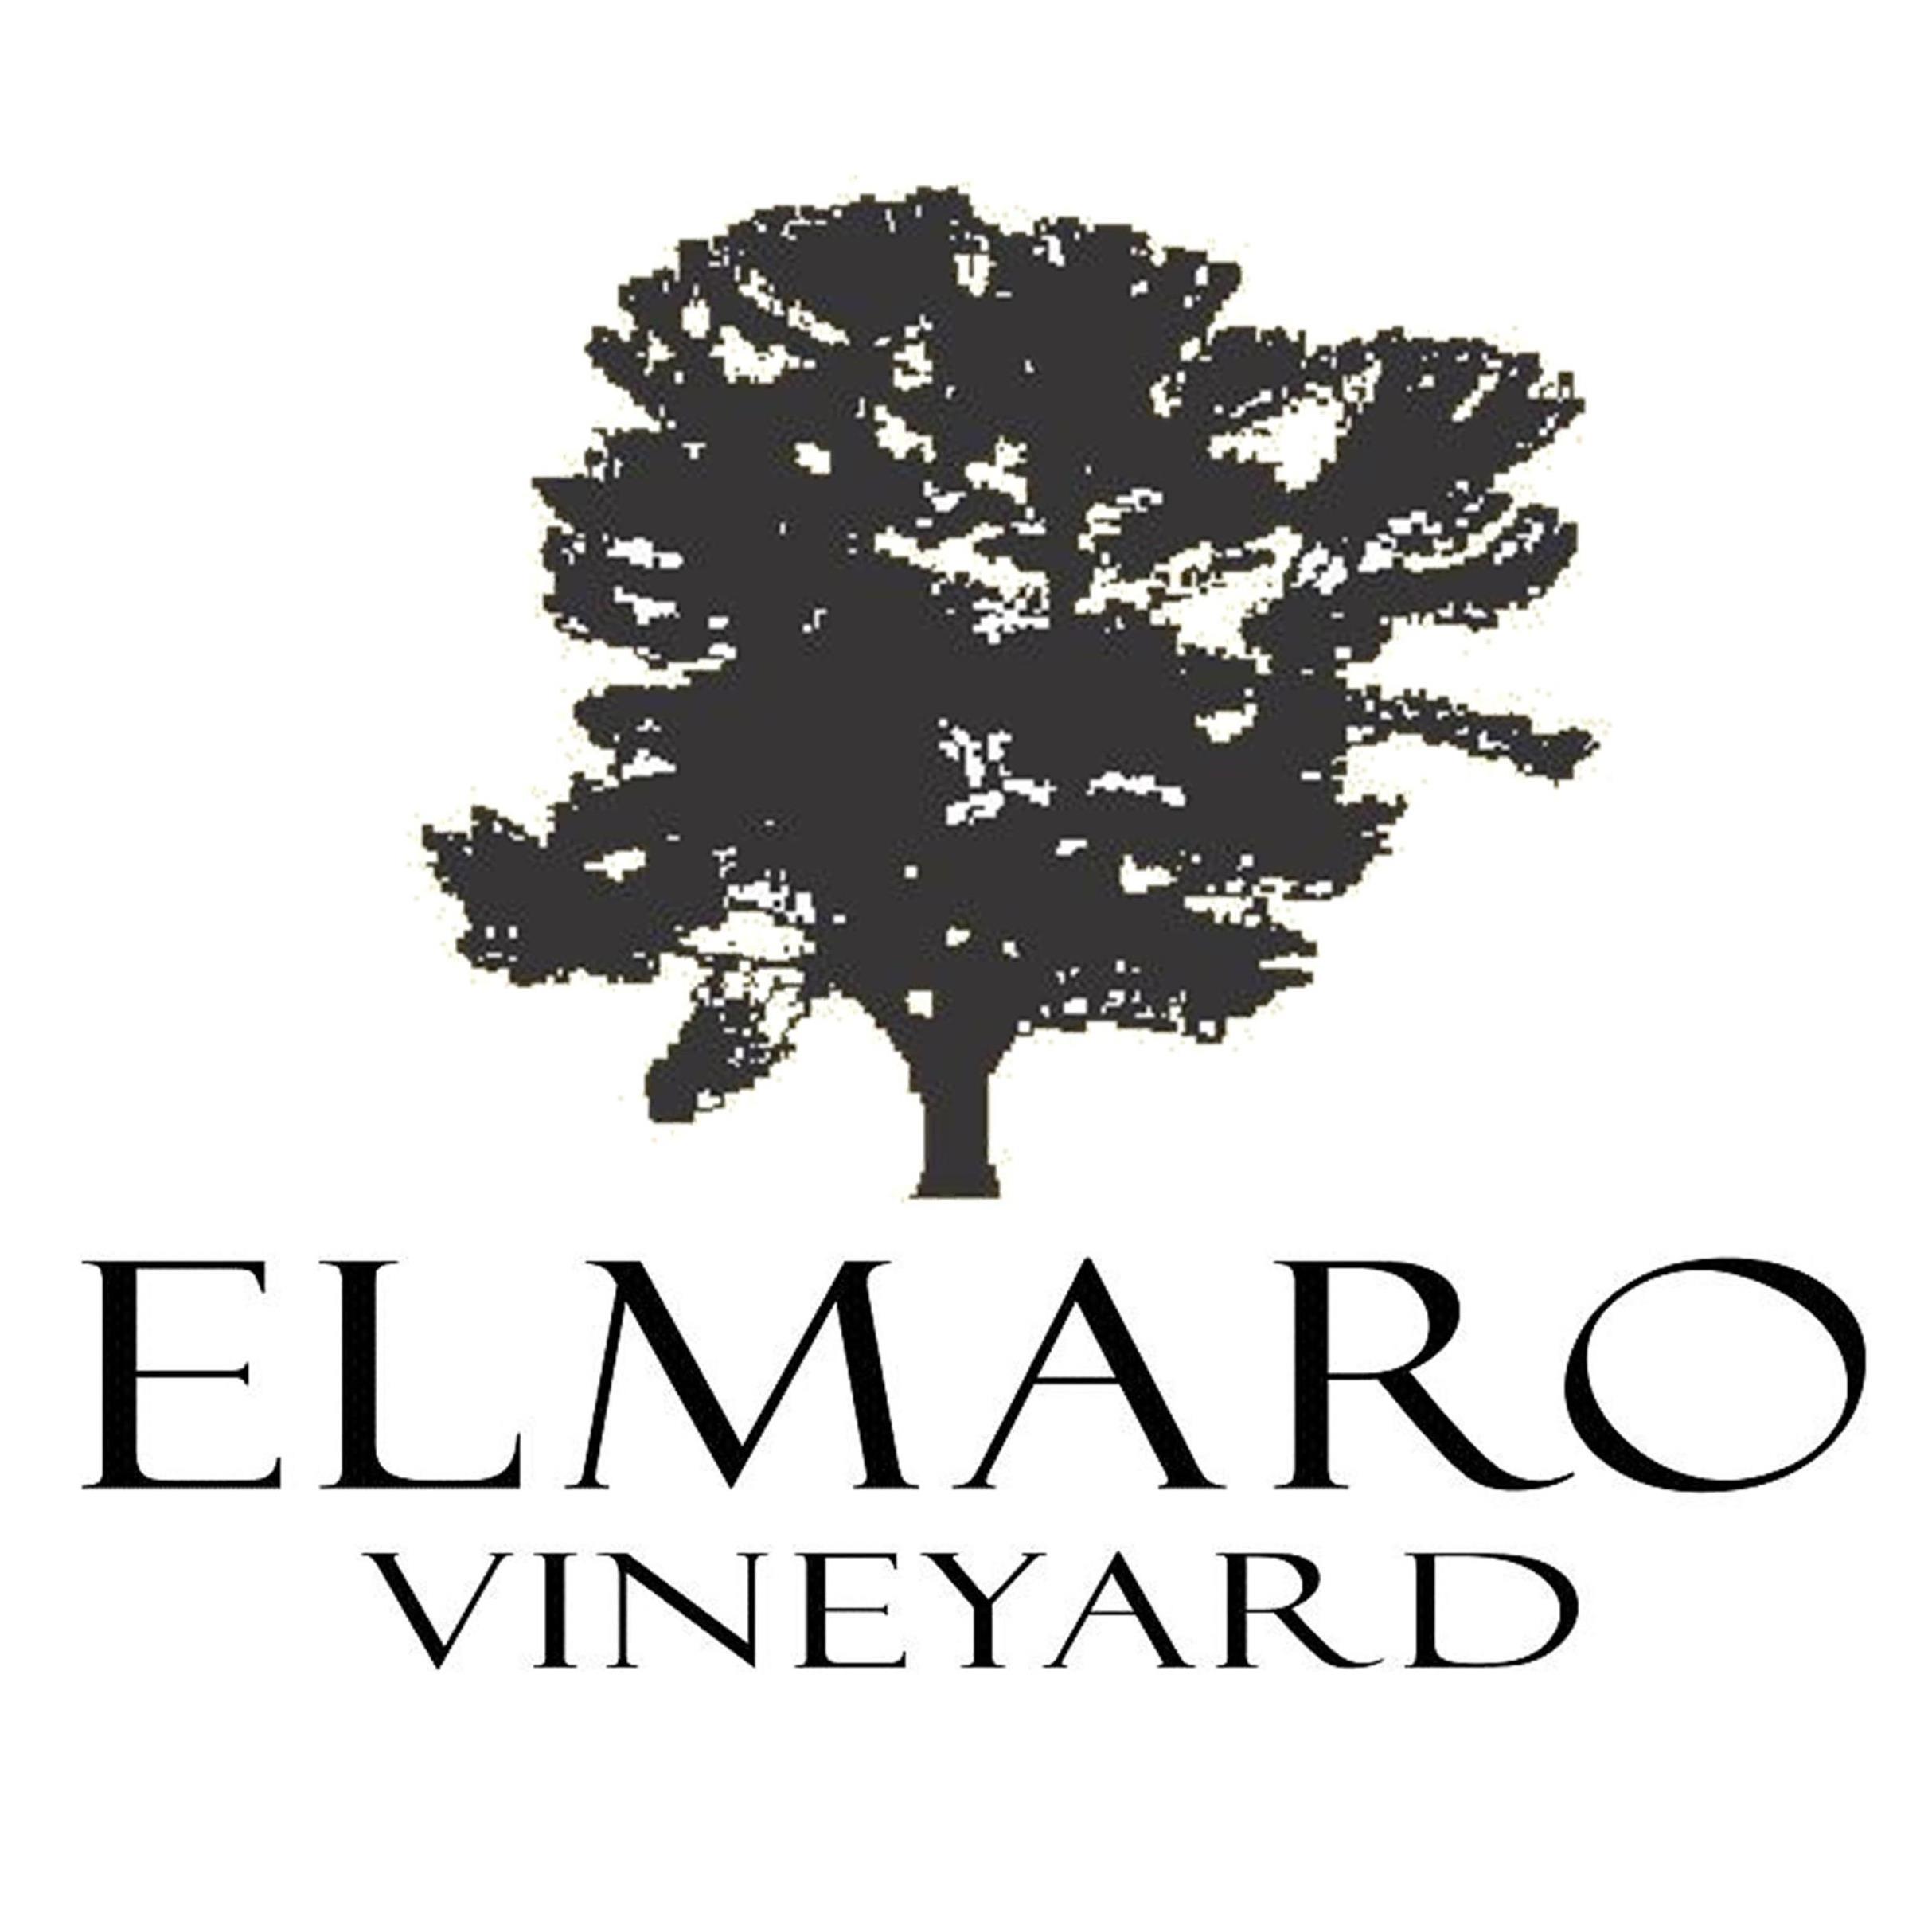 Image result for elmaro vineyard logo